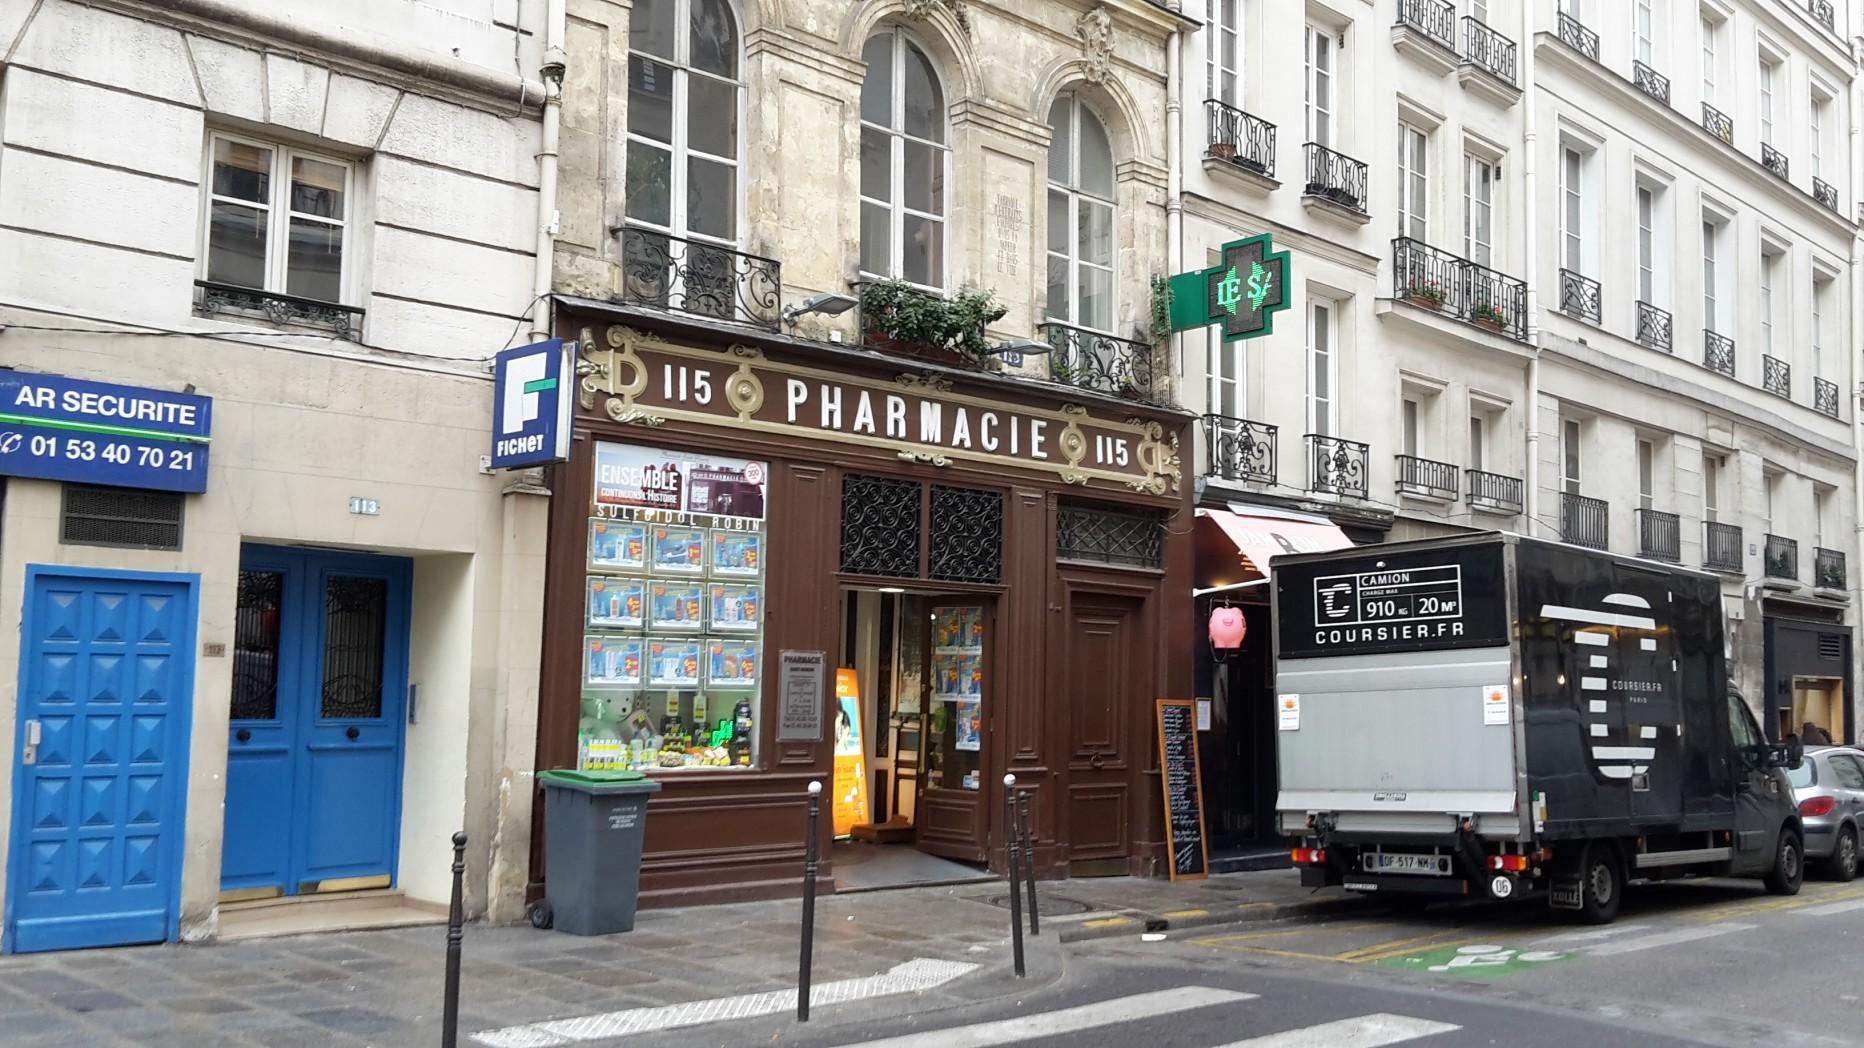 Pharmacie Saint Honoré – Pharmacie Machover